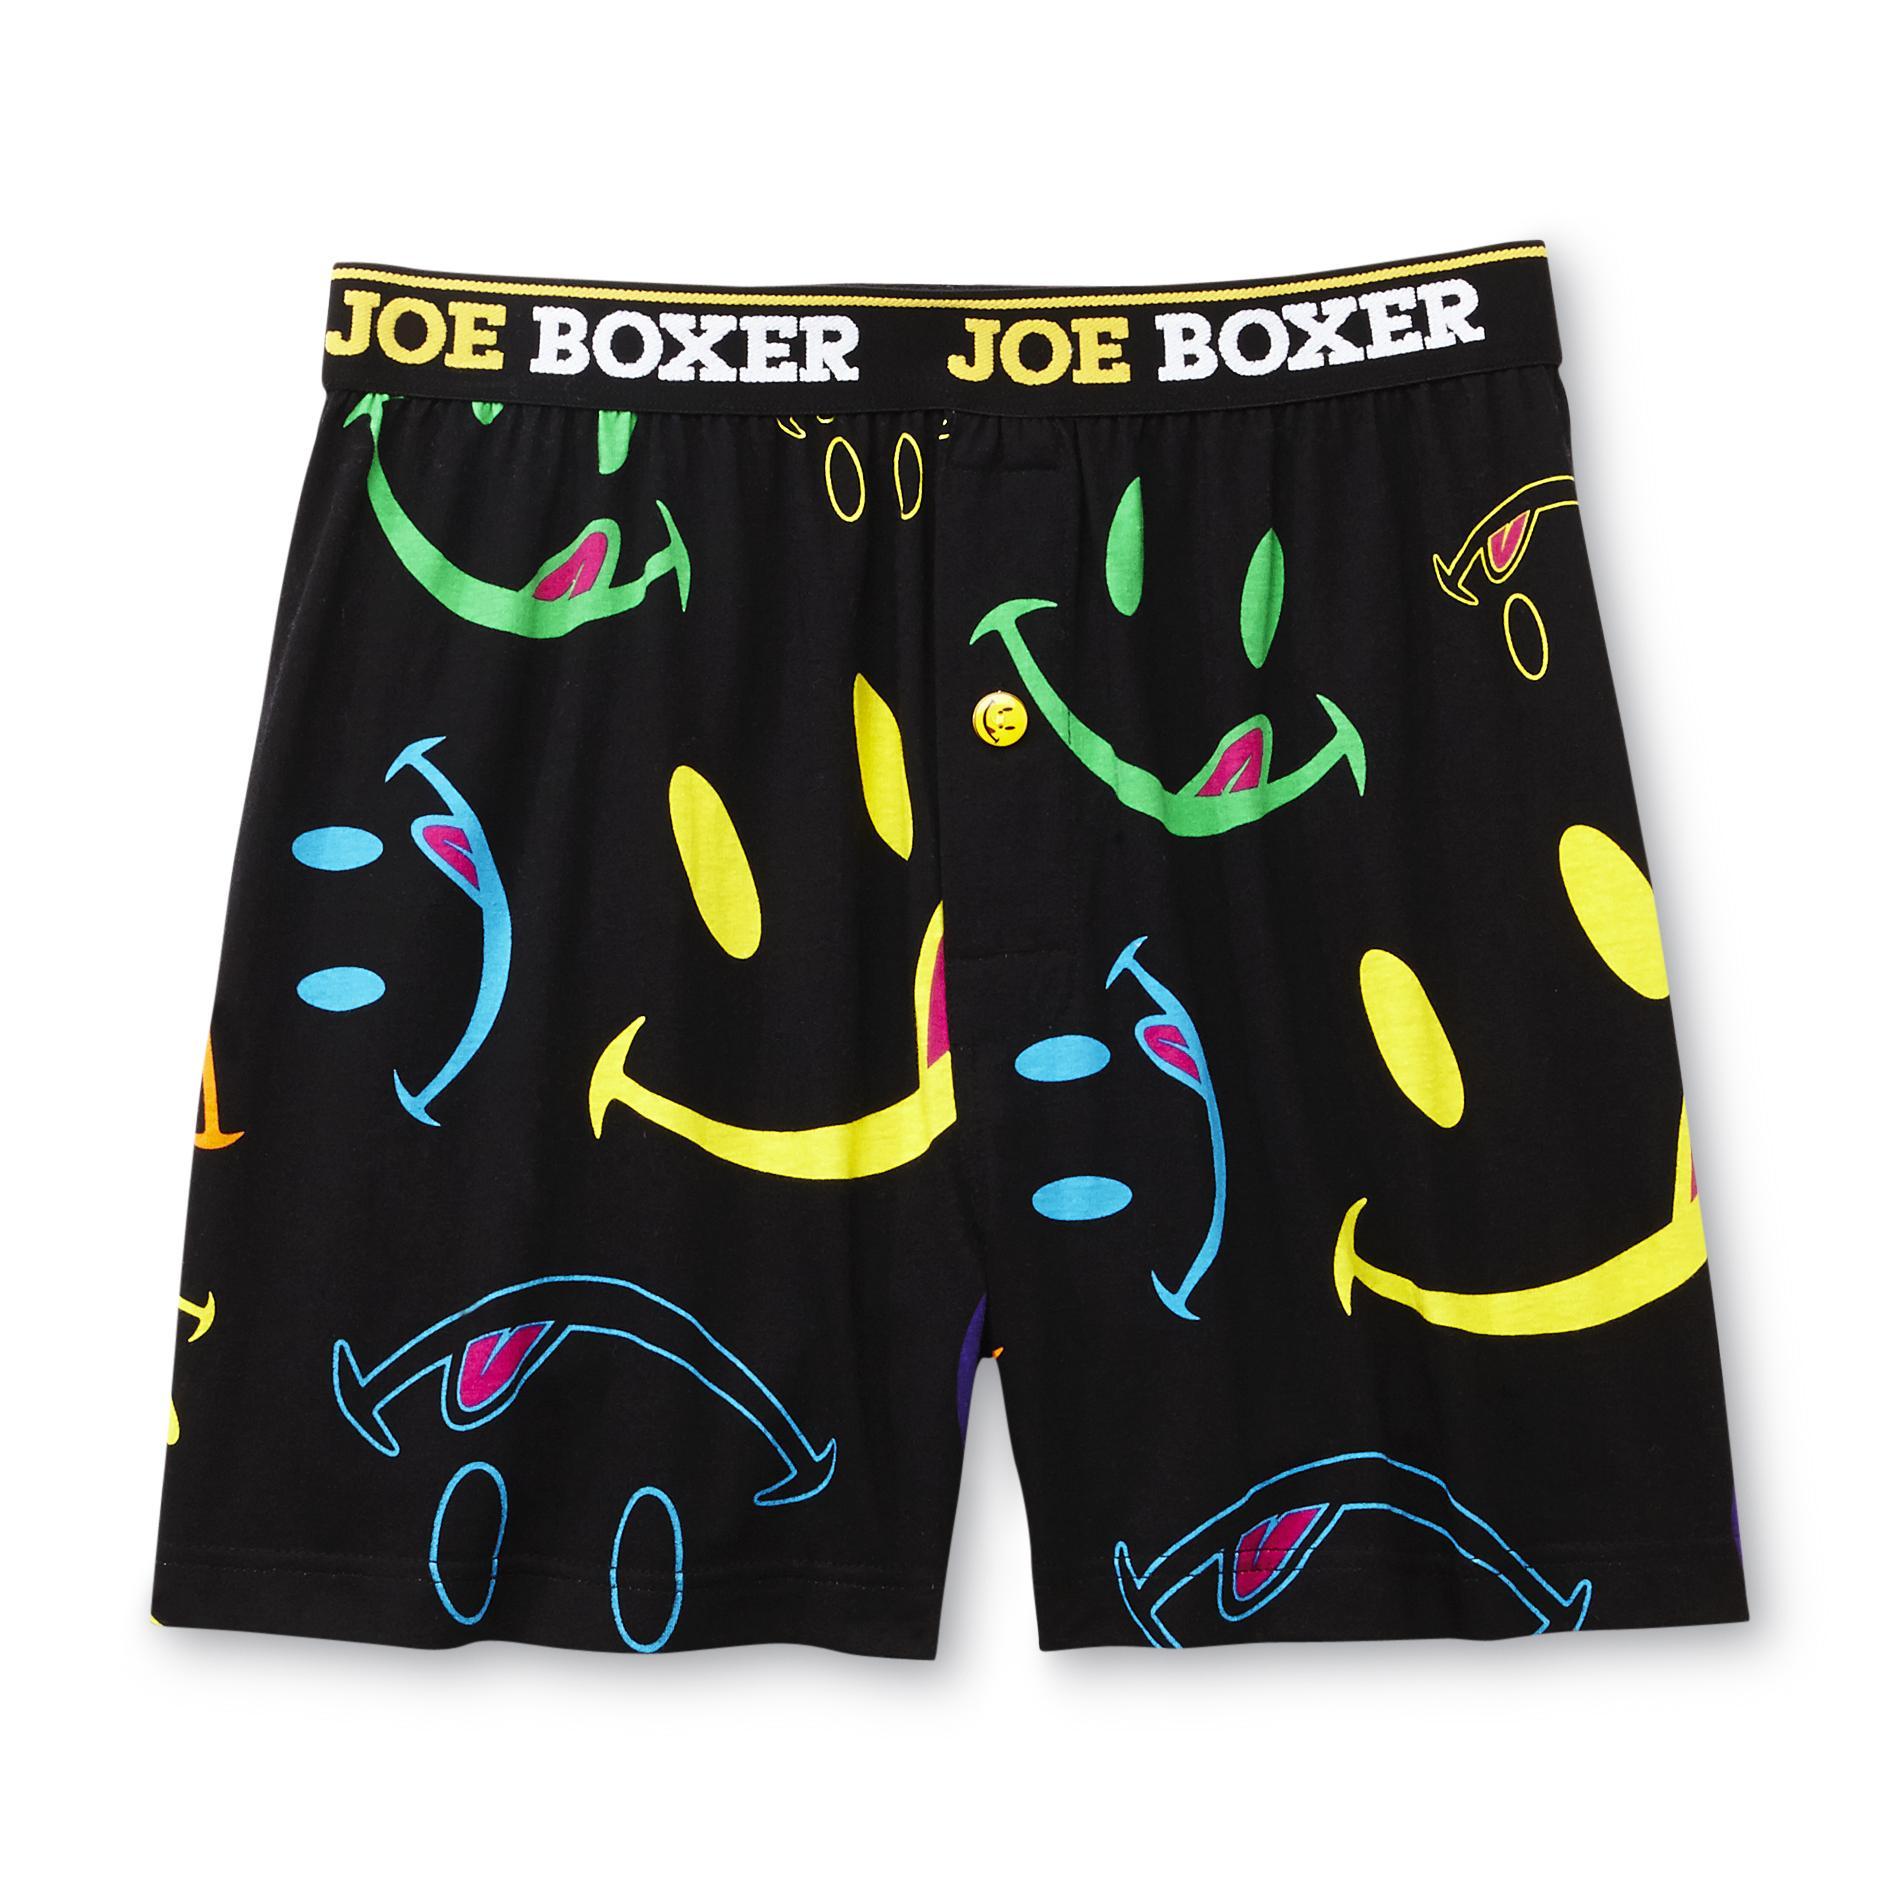 Kmart Joe Boxer Underwear